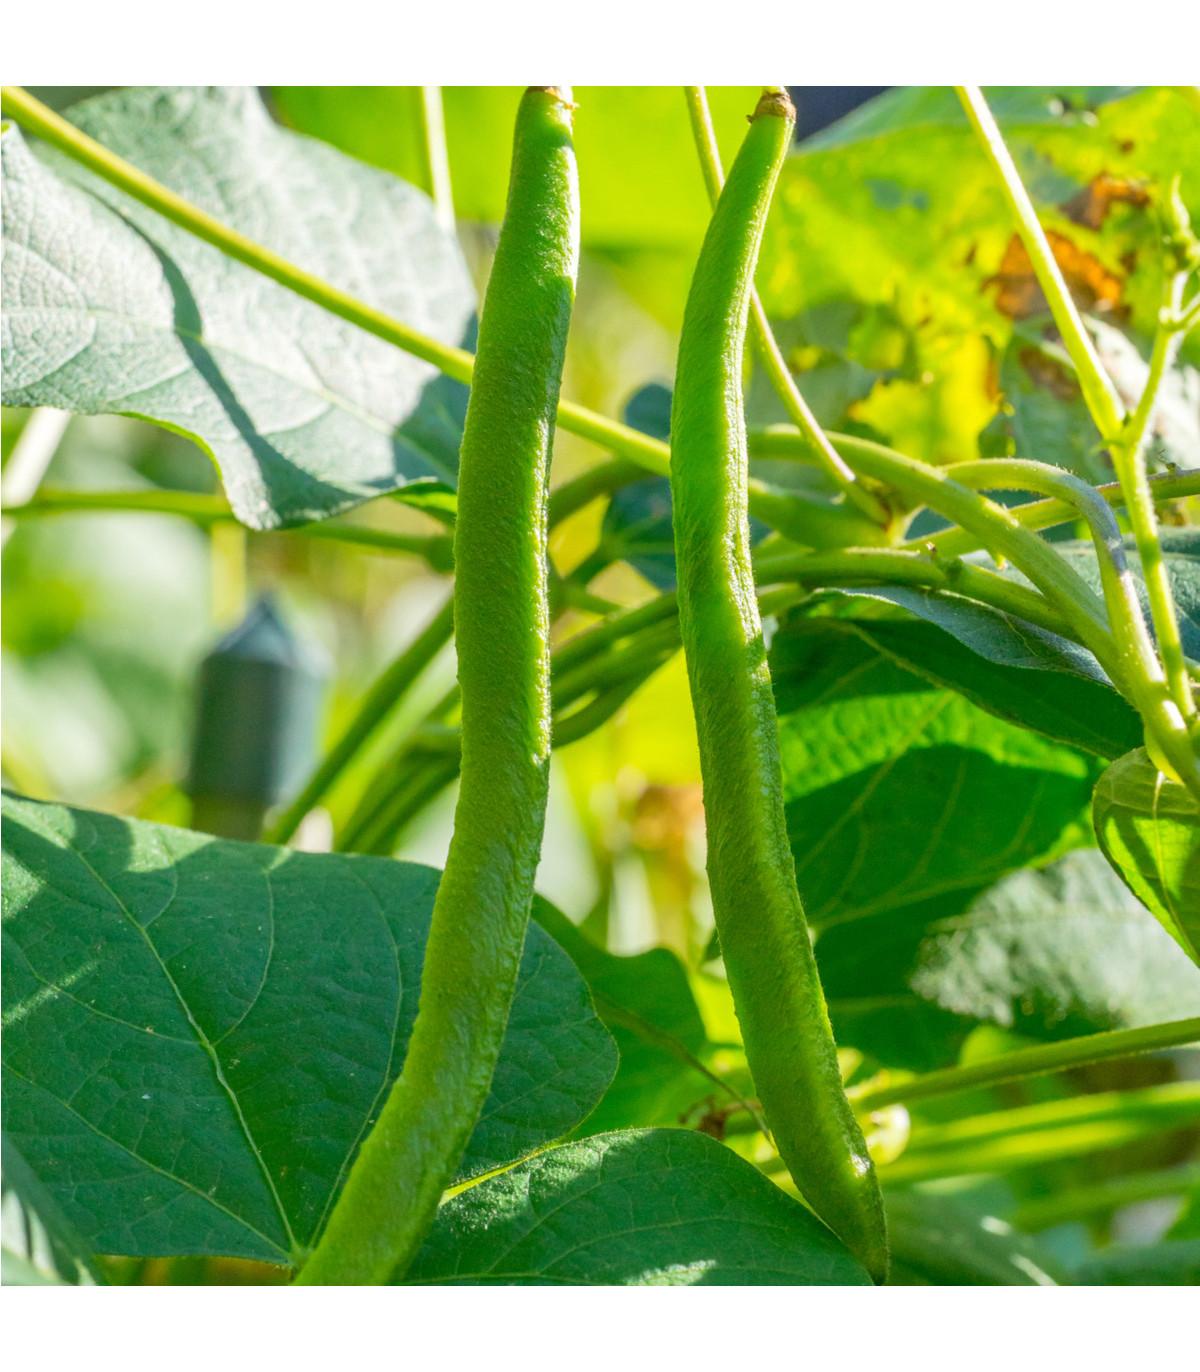 Fazole pnoucí- Phaseolus vulgaris- semena Fazole- 15 ks